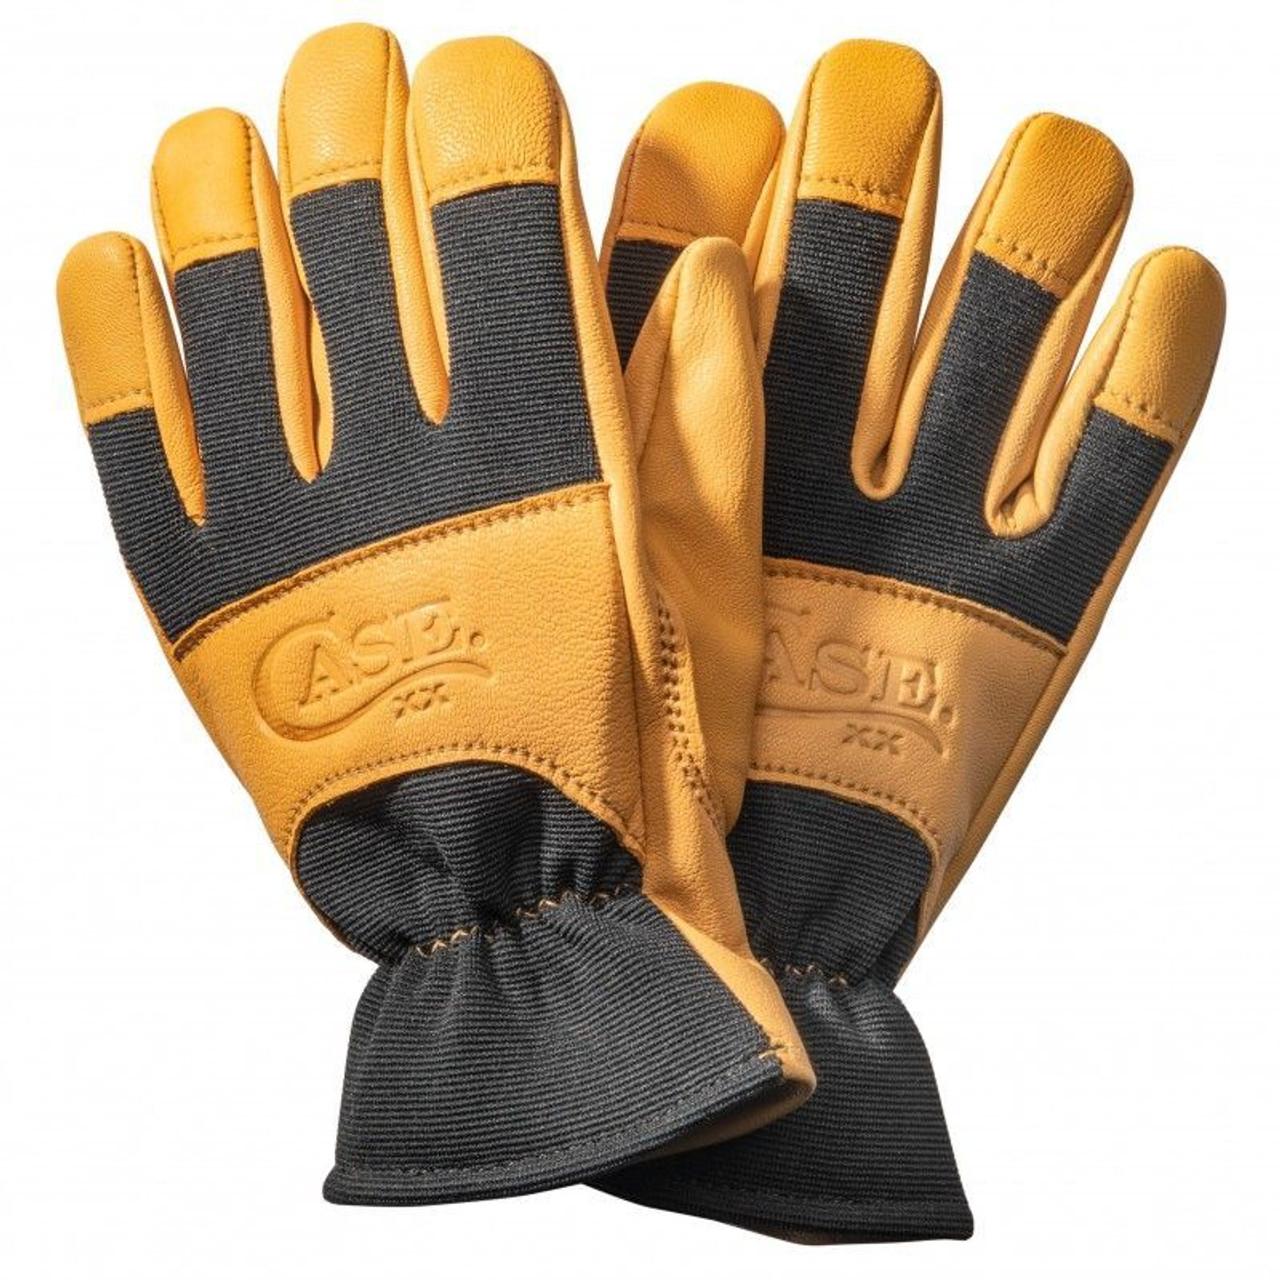 Case XX Logo Embossed Work Gloves Medium Premium Tan Goatskin Leather and Black Spandex